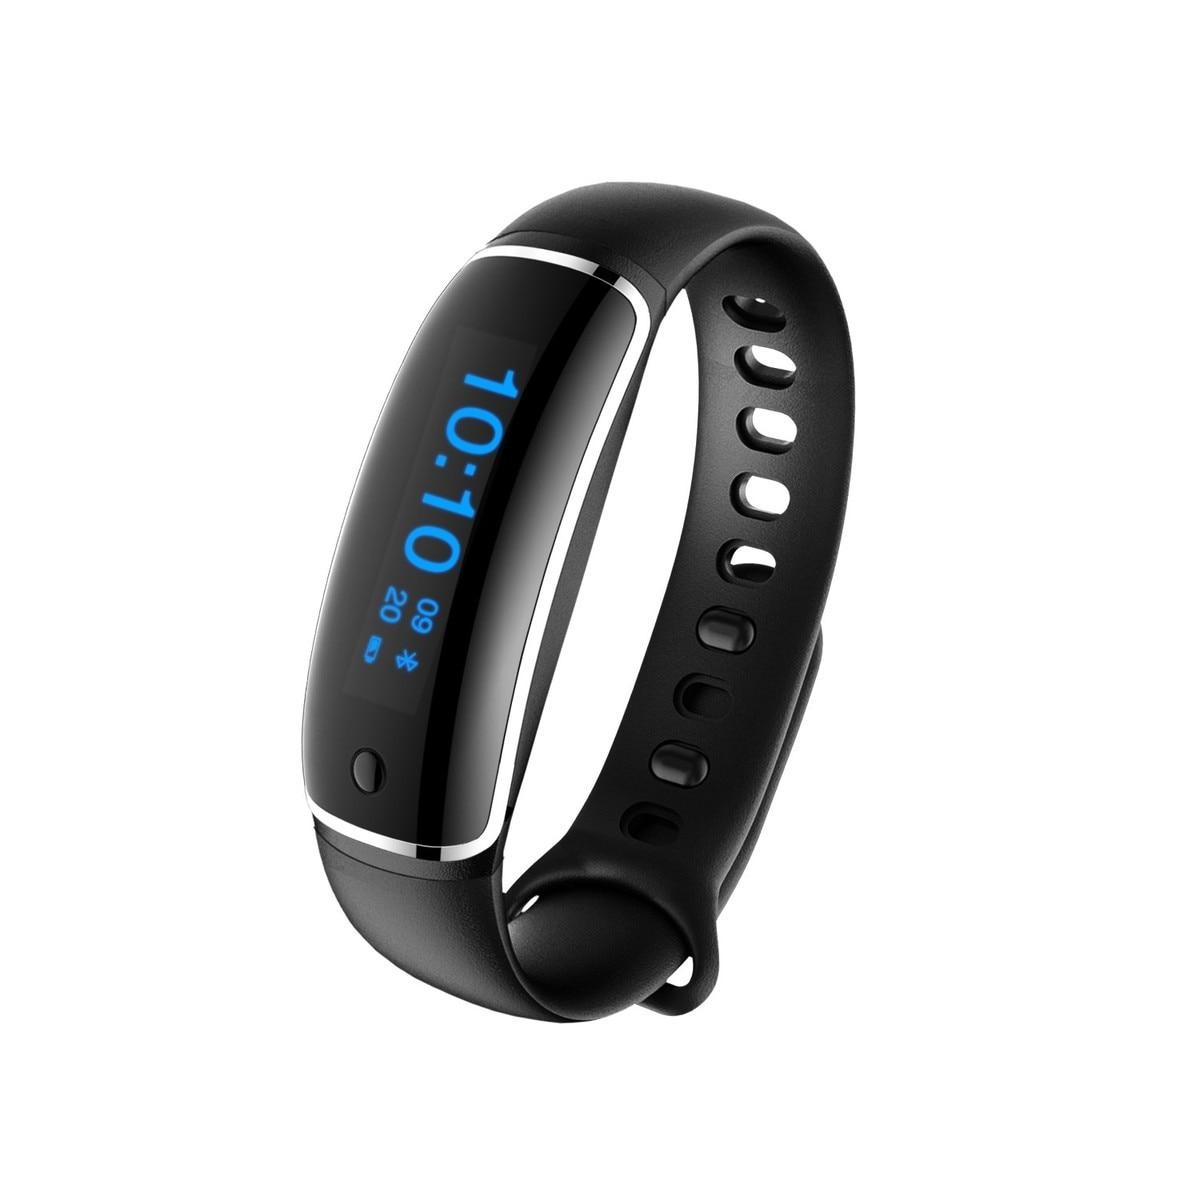 2017 NEW LYNWO M4 Smart Bracelet Blood pressure Dynamic Heart Rate Sports Fitness Tracker Smart Wristband